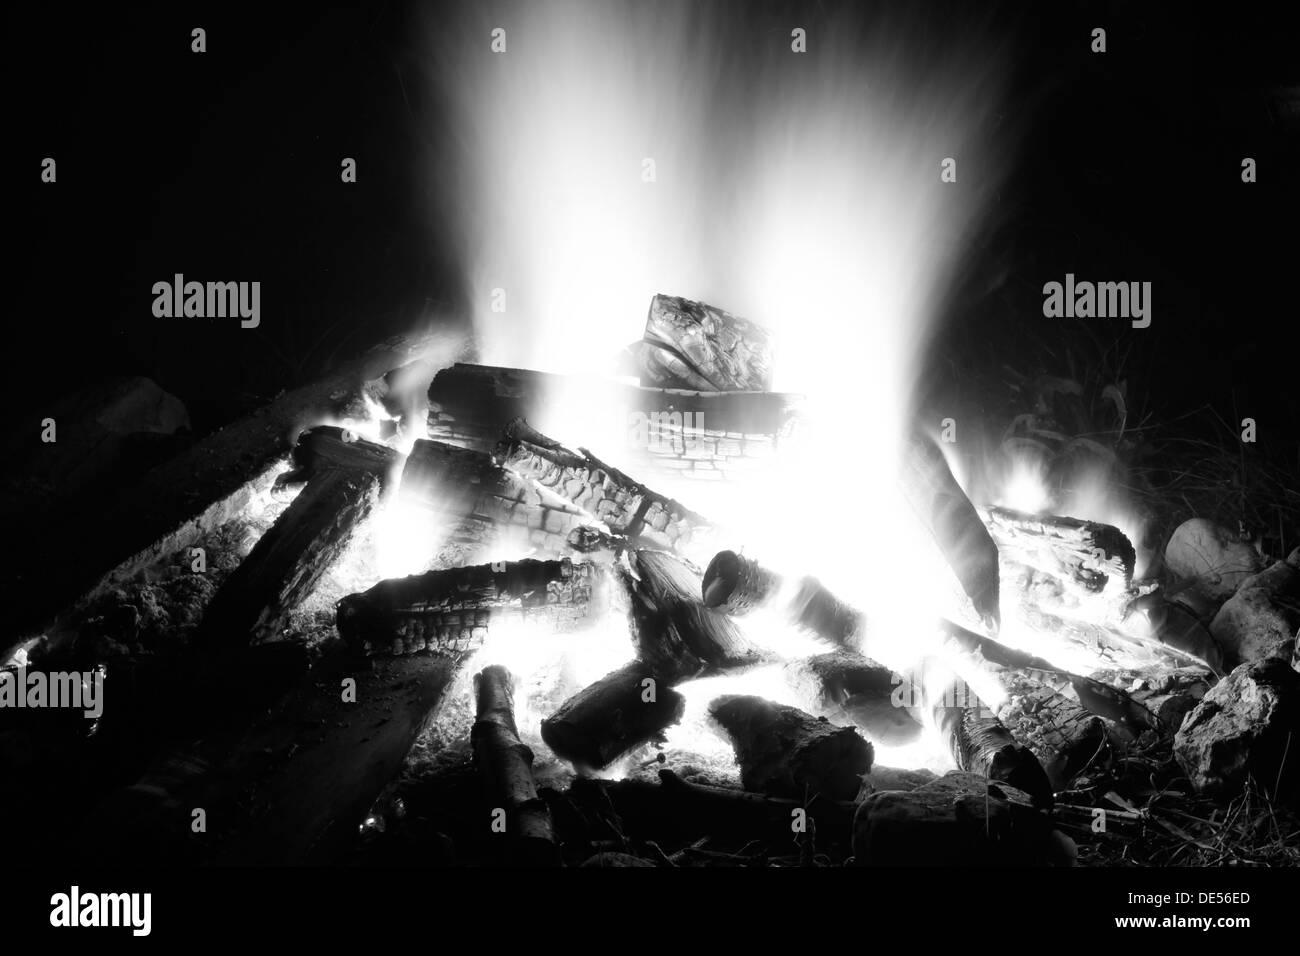 Fire in black and white, Seefeld, Oberbayern, Bavaria, Germany Stock Photo